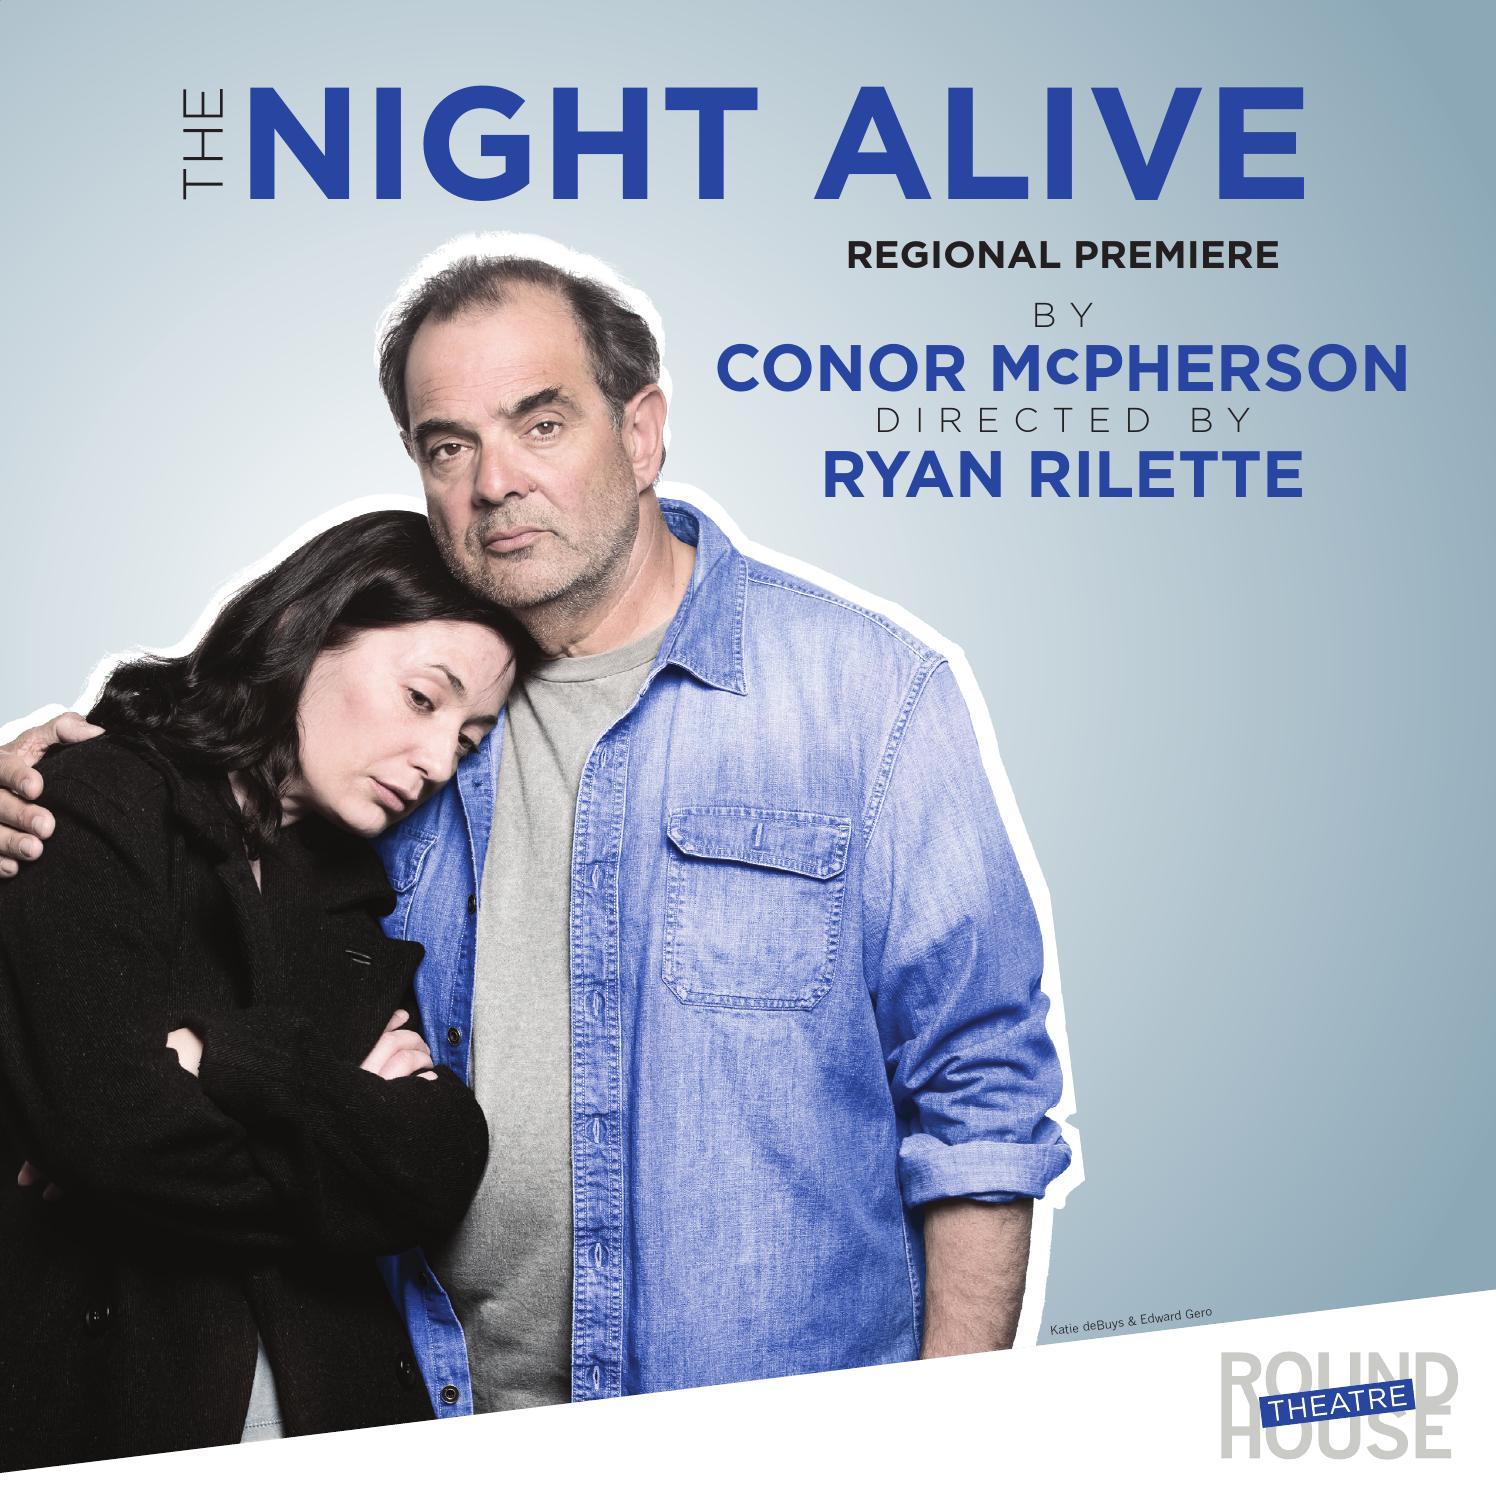 THE NIGHT ALIVE Program